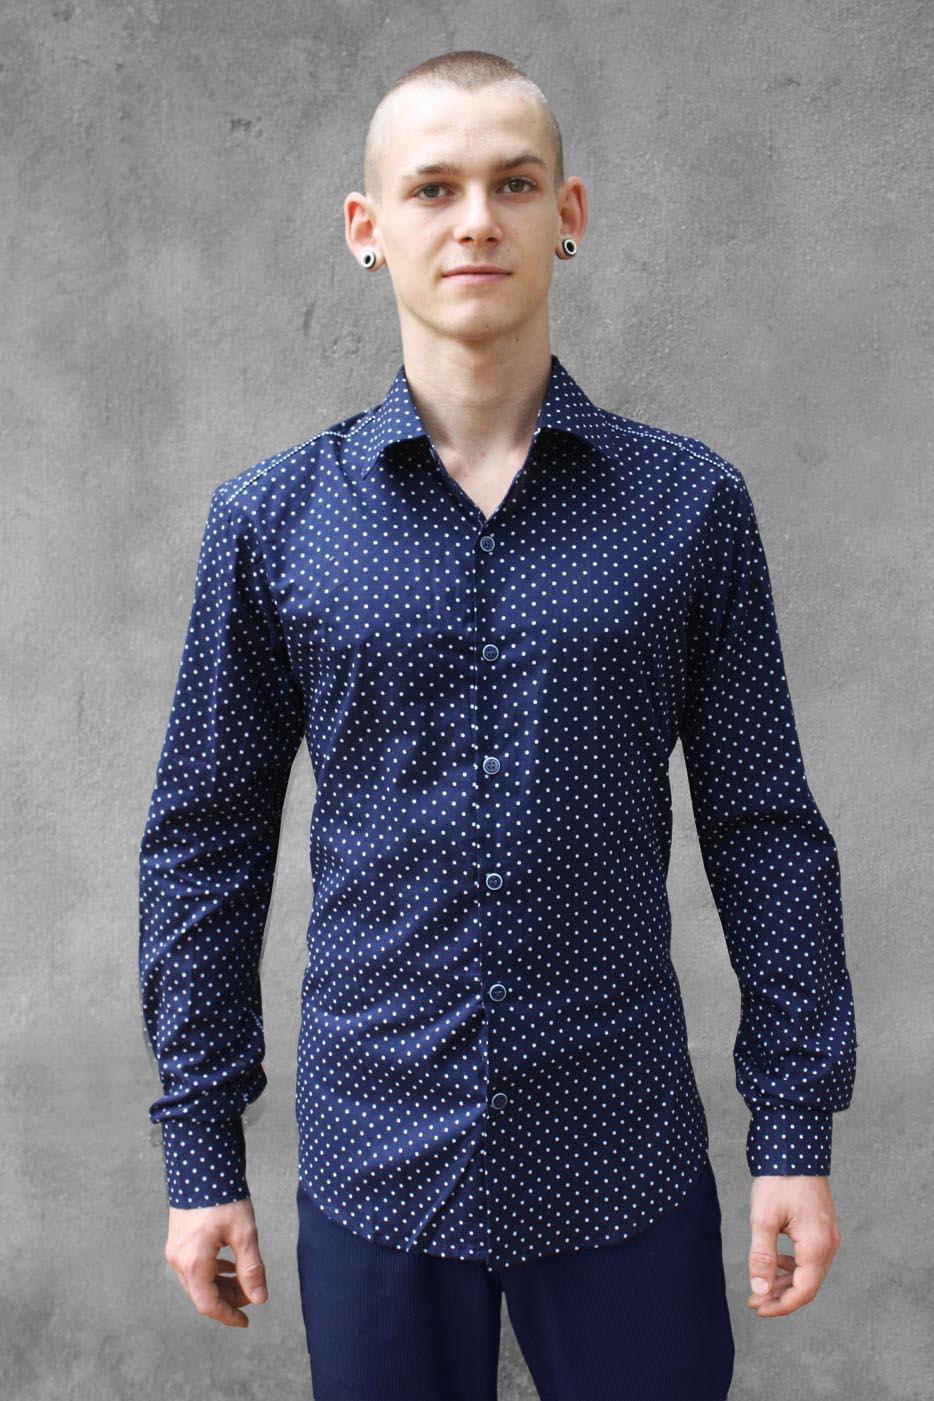 232cb281ba Baïsap - Camisa de lunares - Azul Marino - Camisa azul marino hombre  Compartir